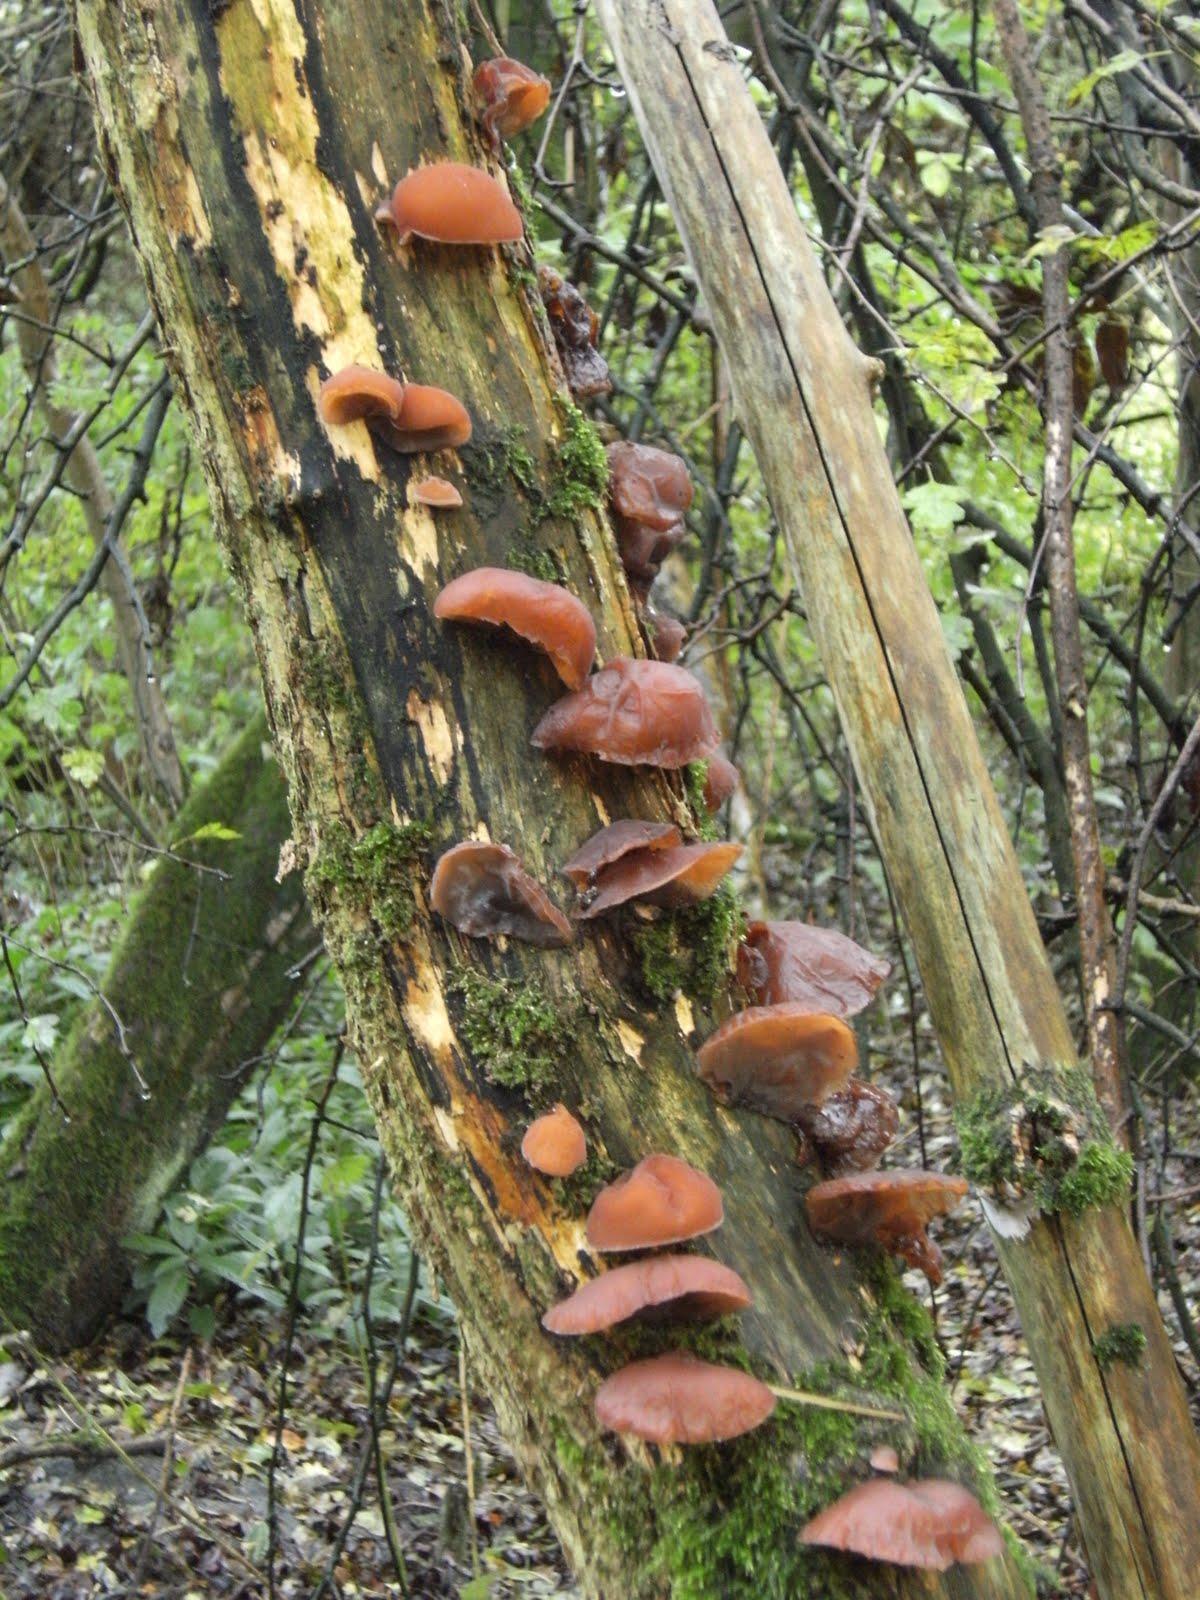 1010300015 Ear fungus